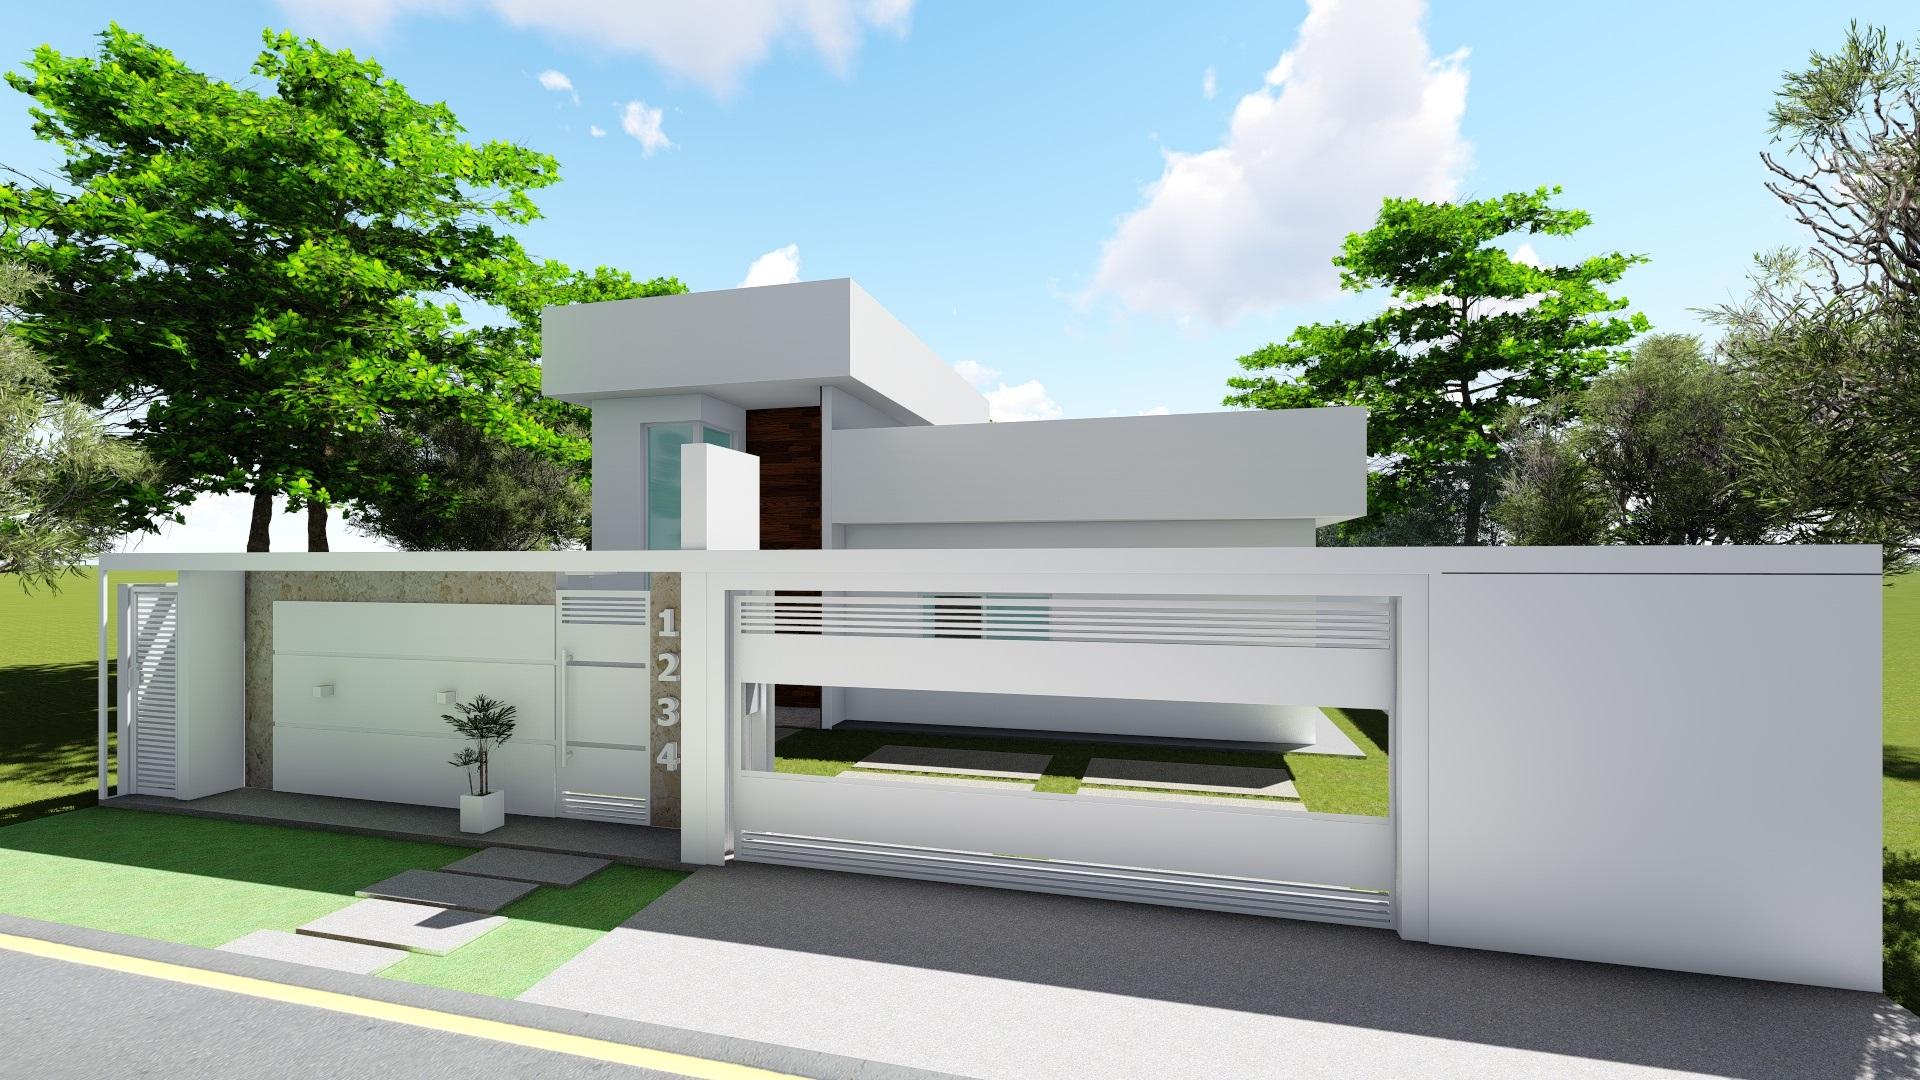 construção-projeto-condominio_alto_da_boa_vista_-_CAVB_(4)